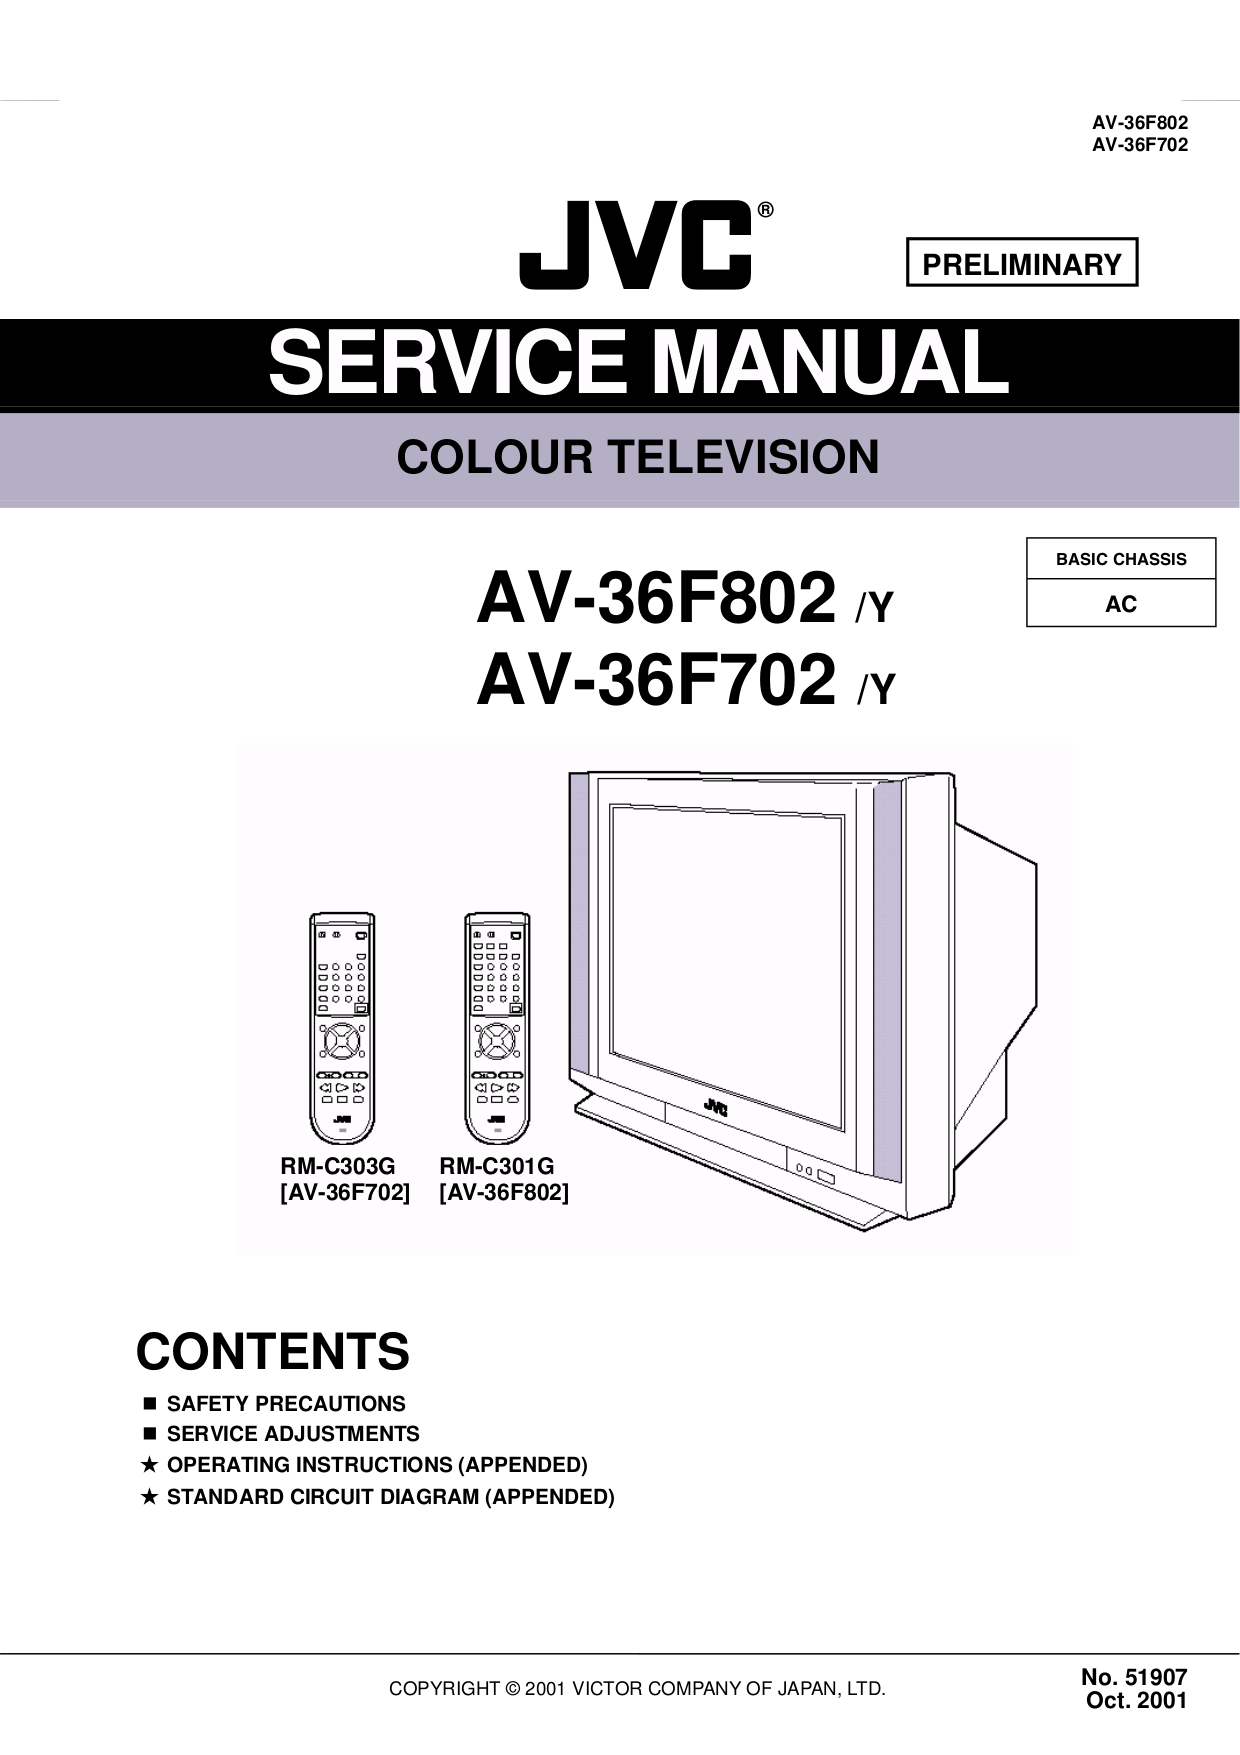 Jvc Tv Diagram Archive Of Automotive Wiring T V Circuit Download Free Pdf For Av 27f702 Manual Rh Umlib Com Crt